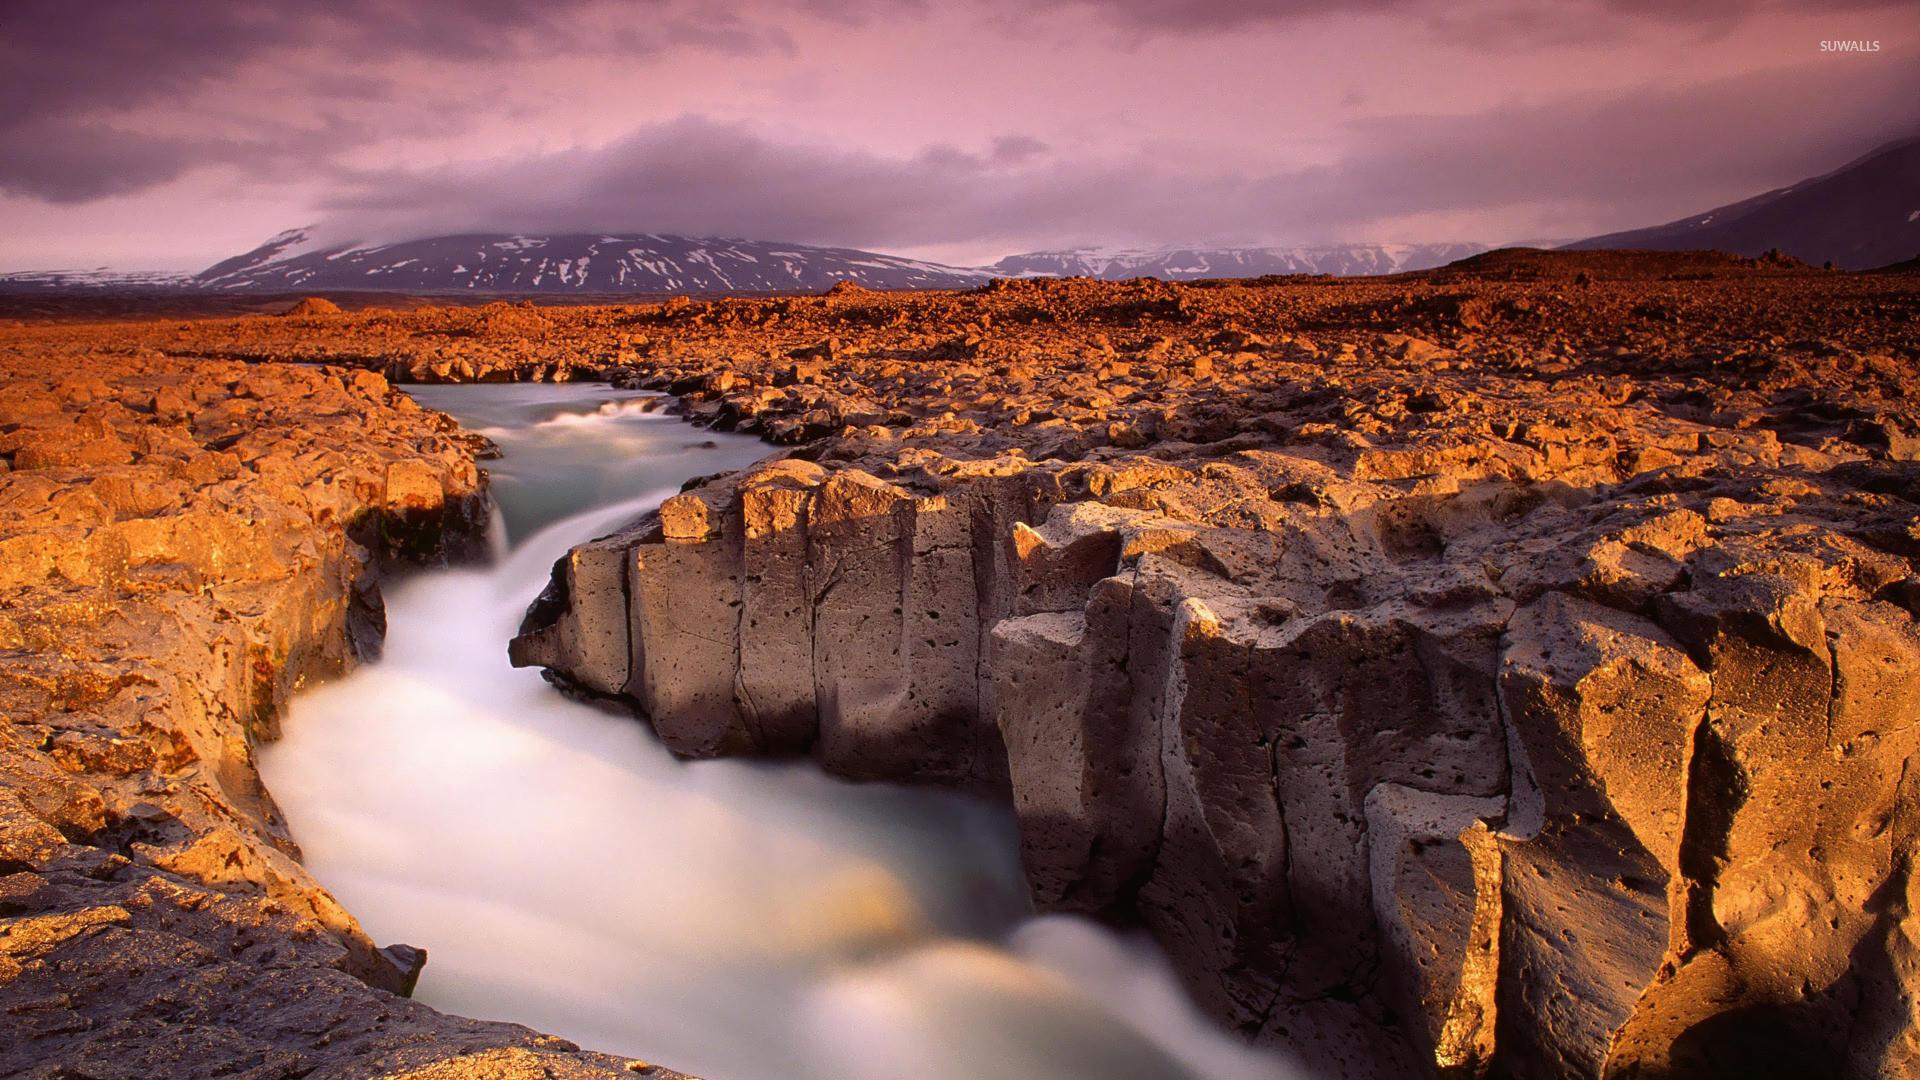 Kaldidalur, Iceland wallpaper